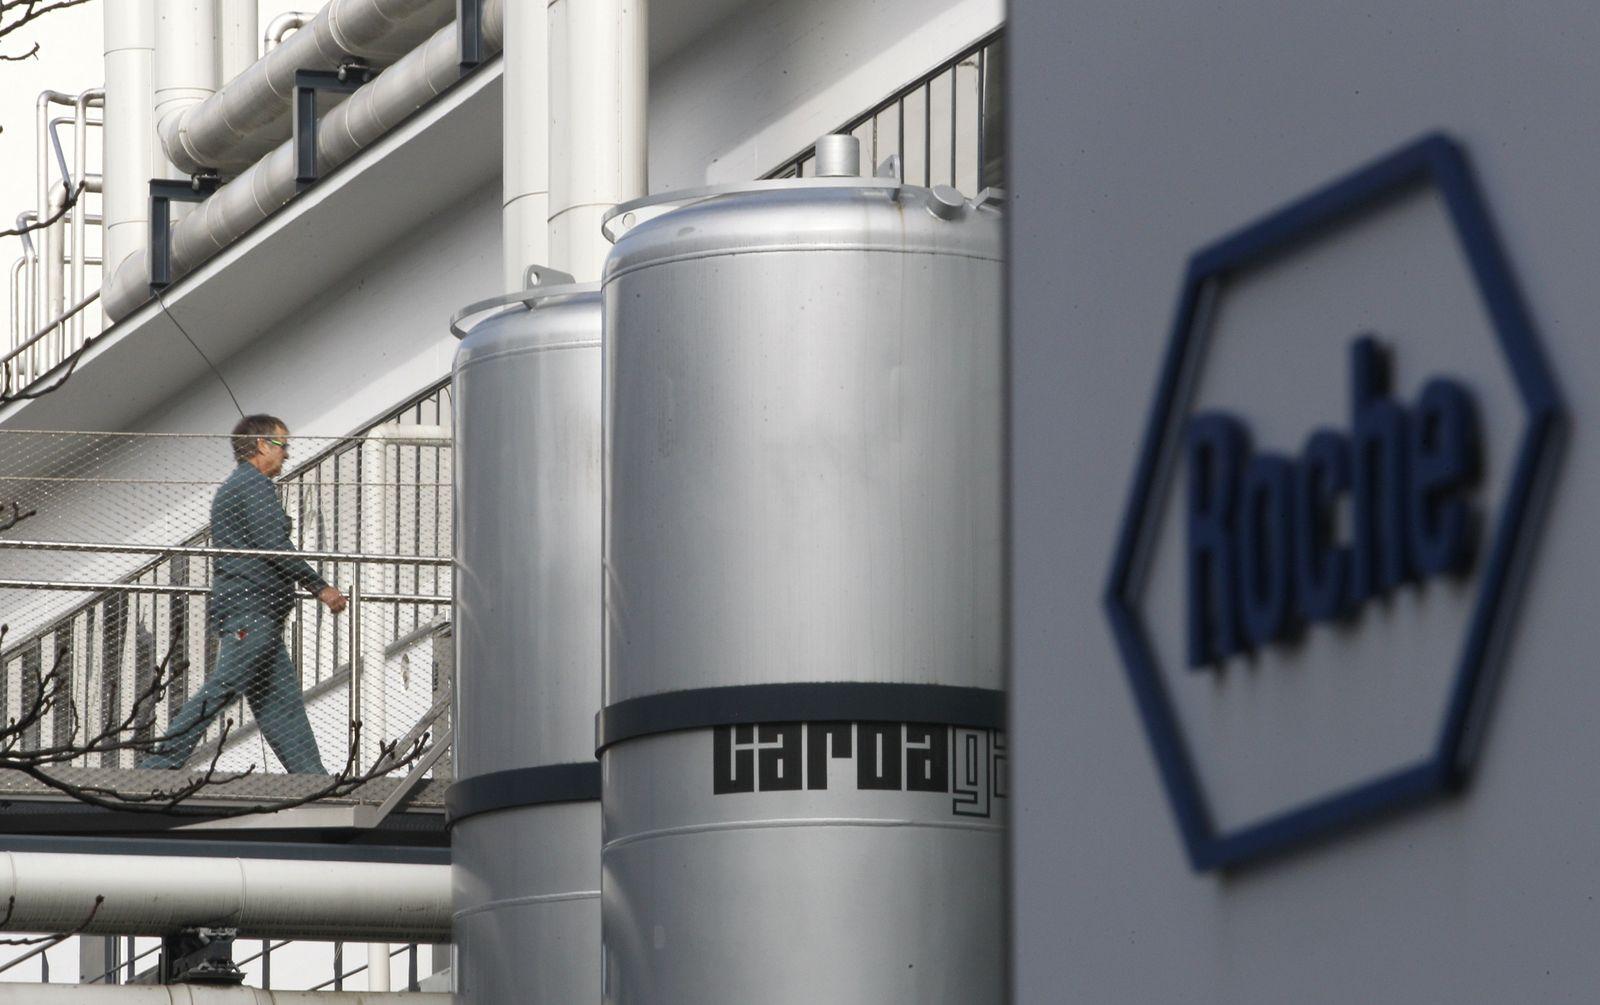 Roche / Pharmakonzern